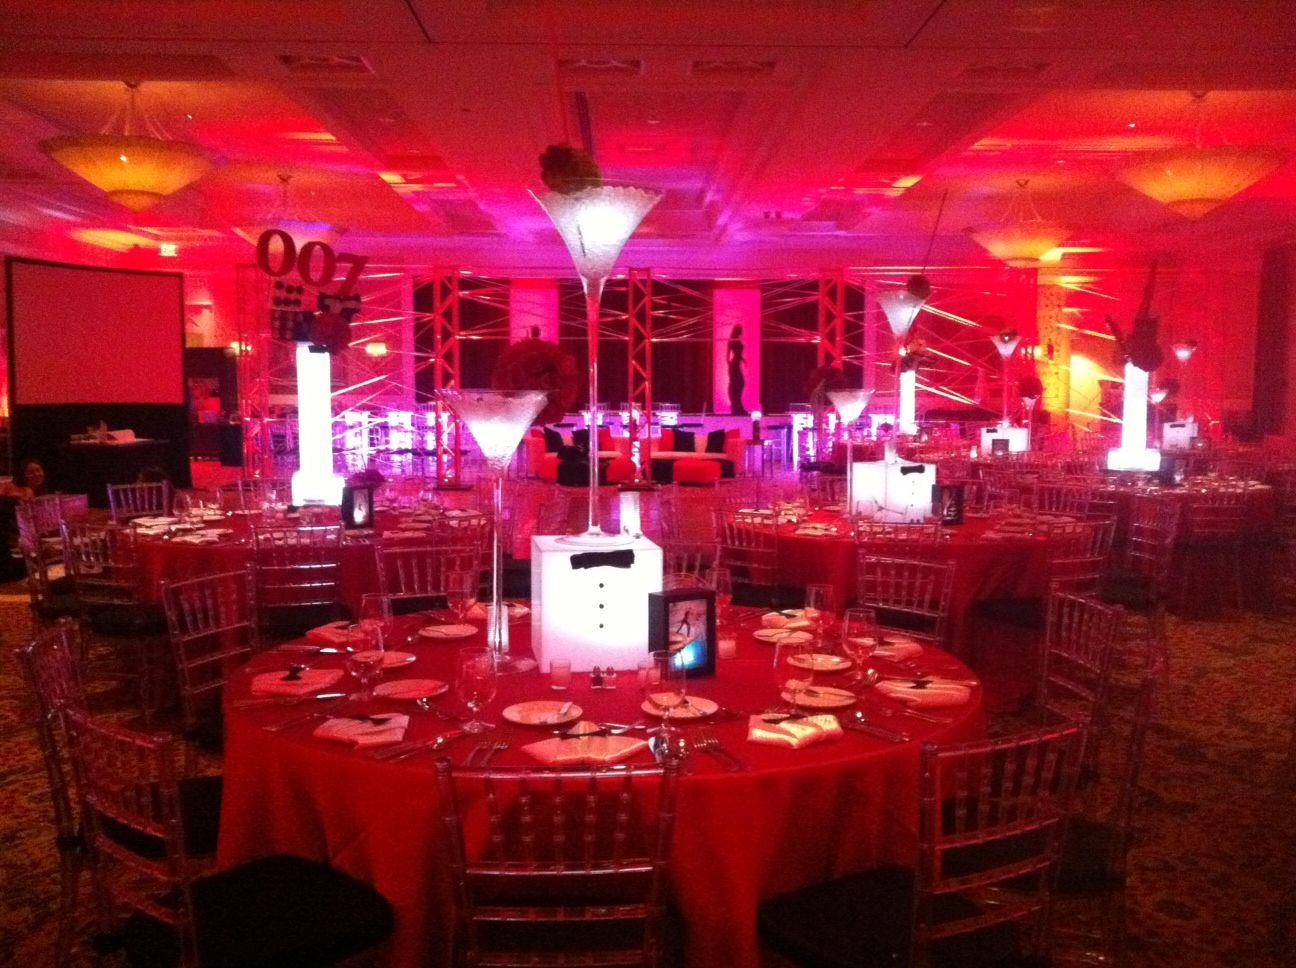 Tags bar and bat mitzvah event decor themes venues - James Bond 007 Theme Bar Mitzvah Event Decor Party Perfect Boca Raton Fl 1